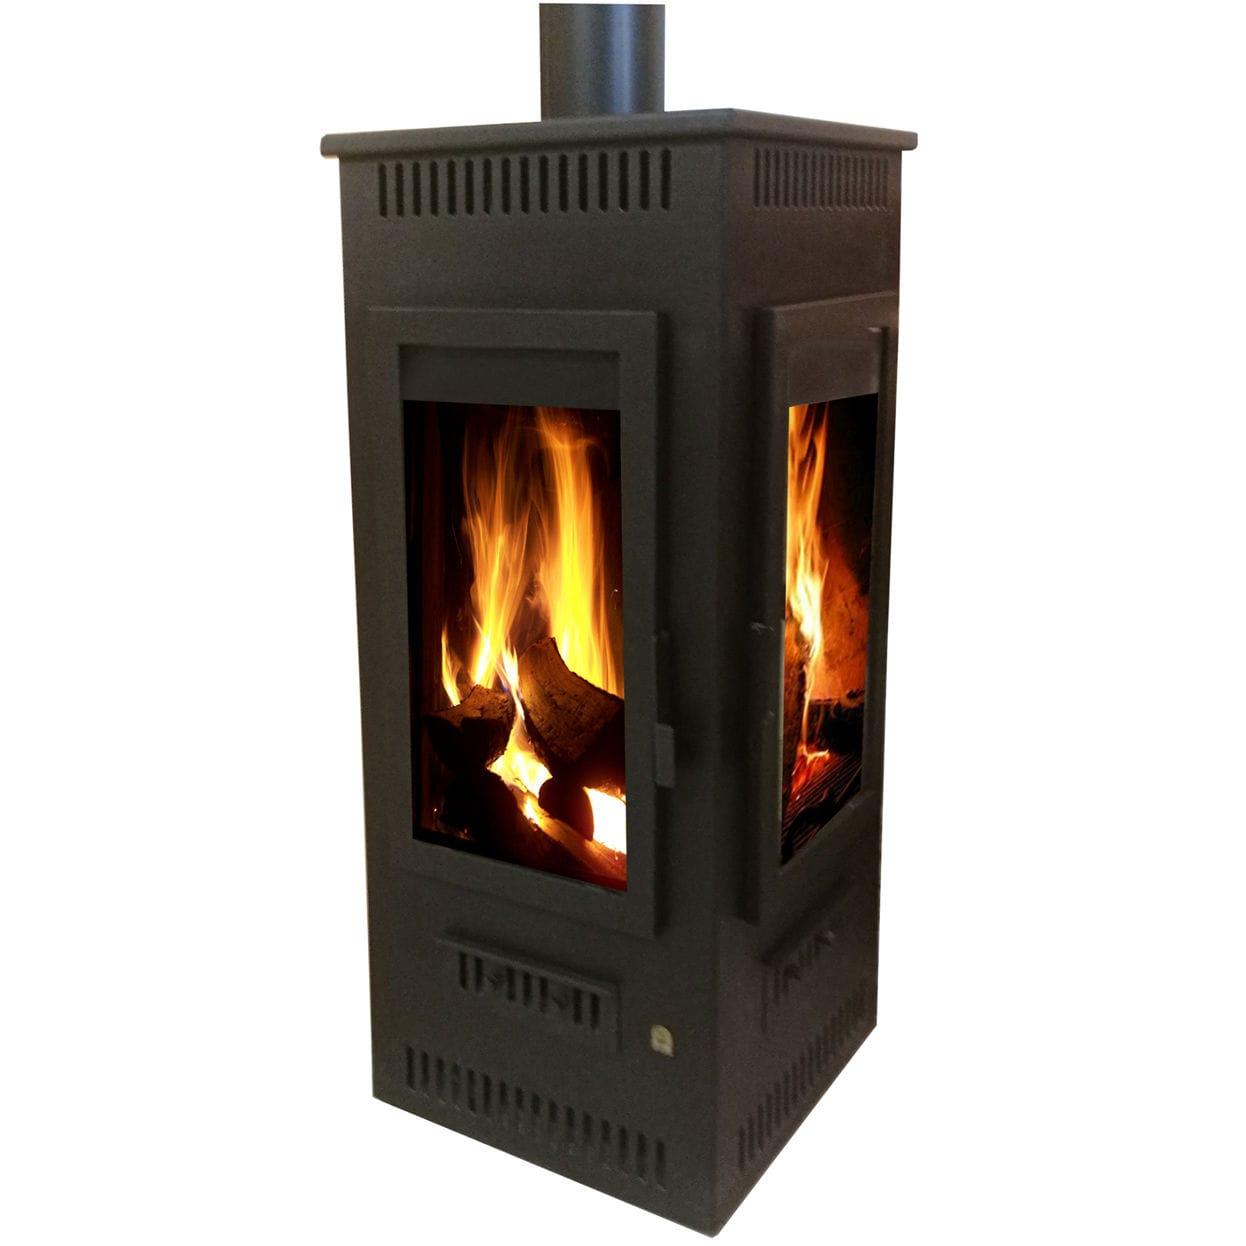 Wood Heating Stove Corner 2 Sided Steel